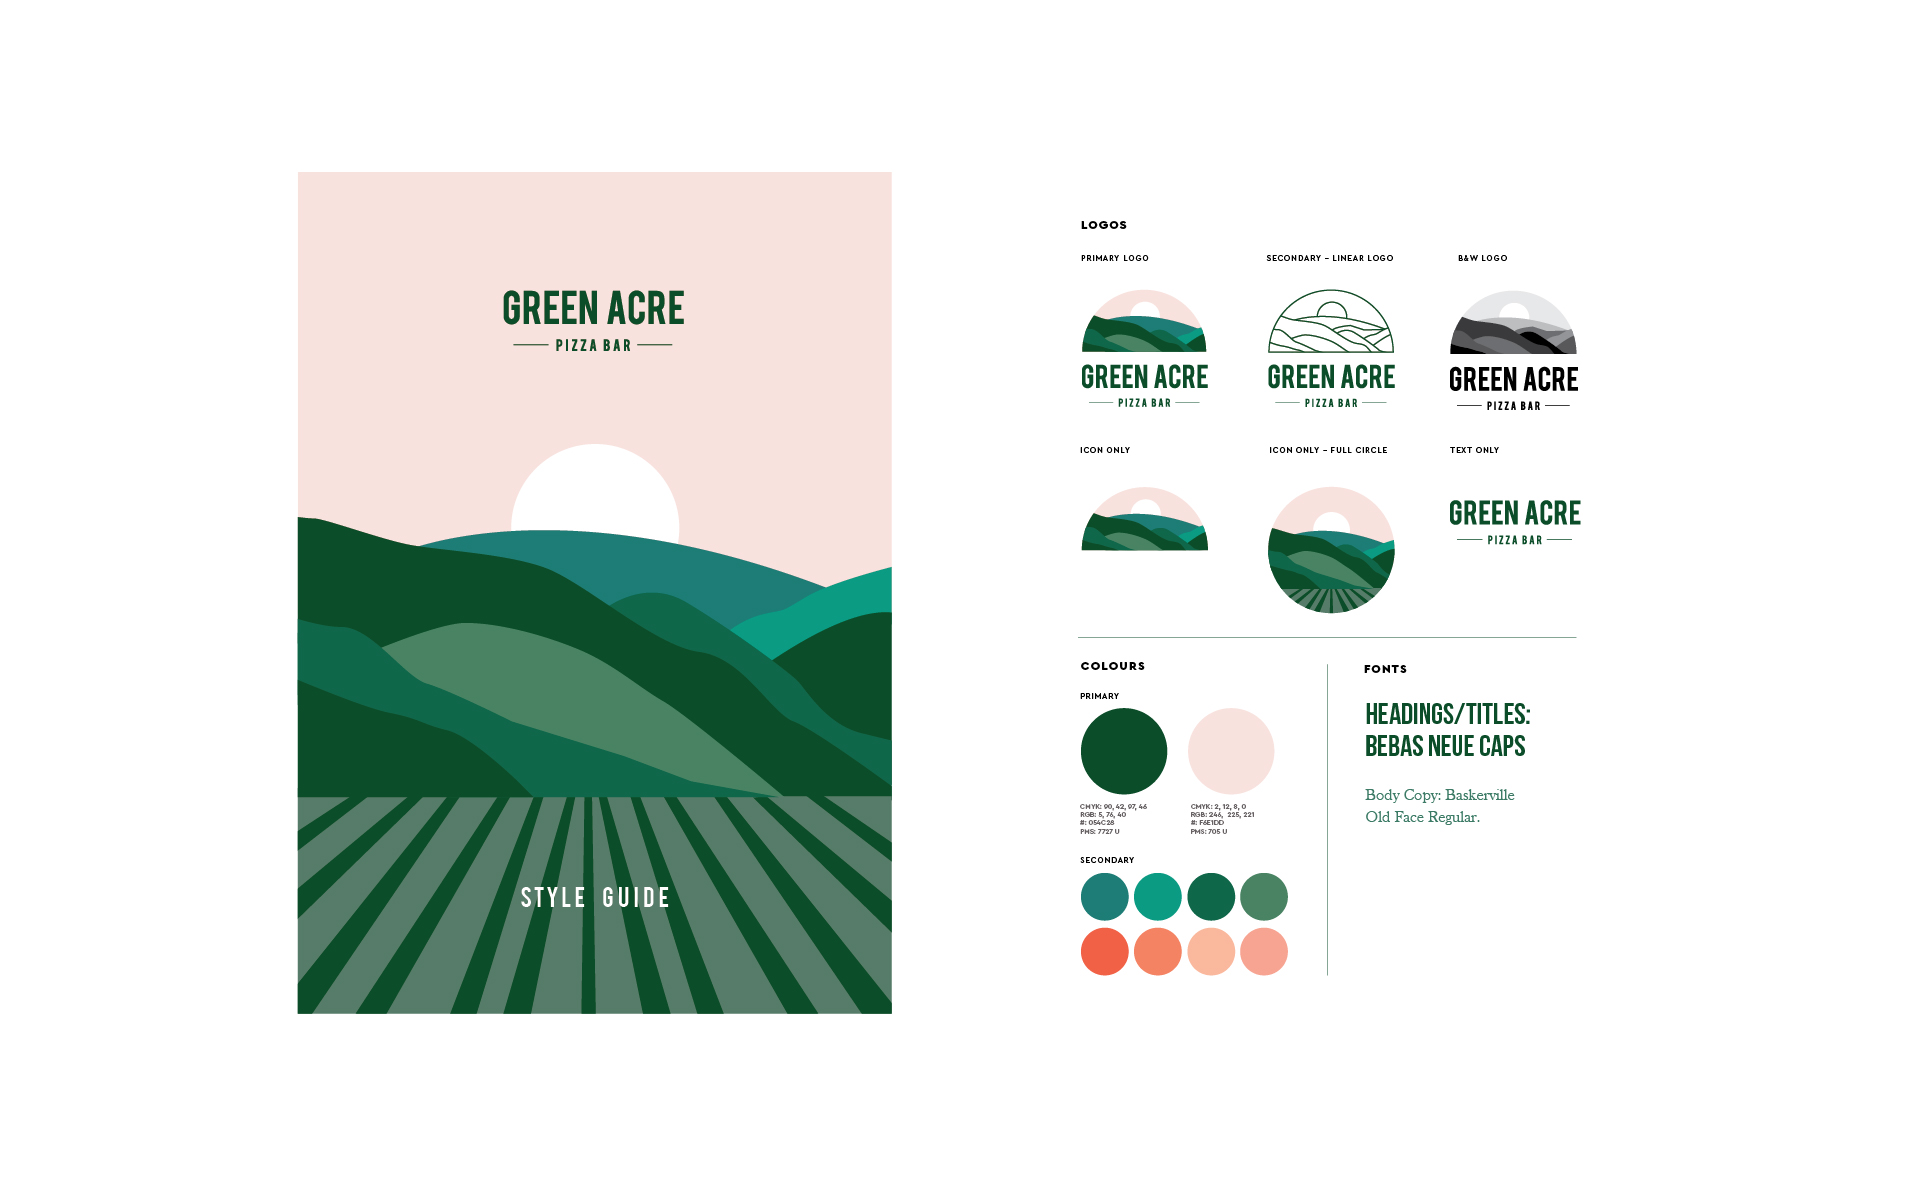 Green Acre Pizza Bar Studio Mimi Moon Design Branding Melbourne